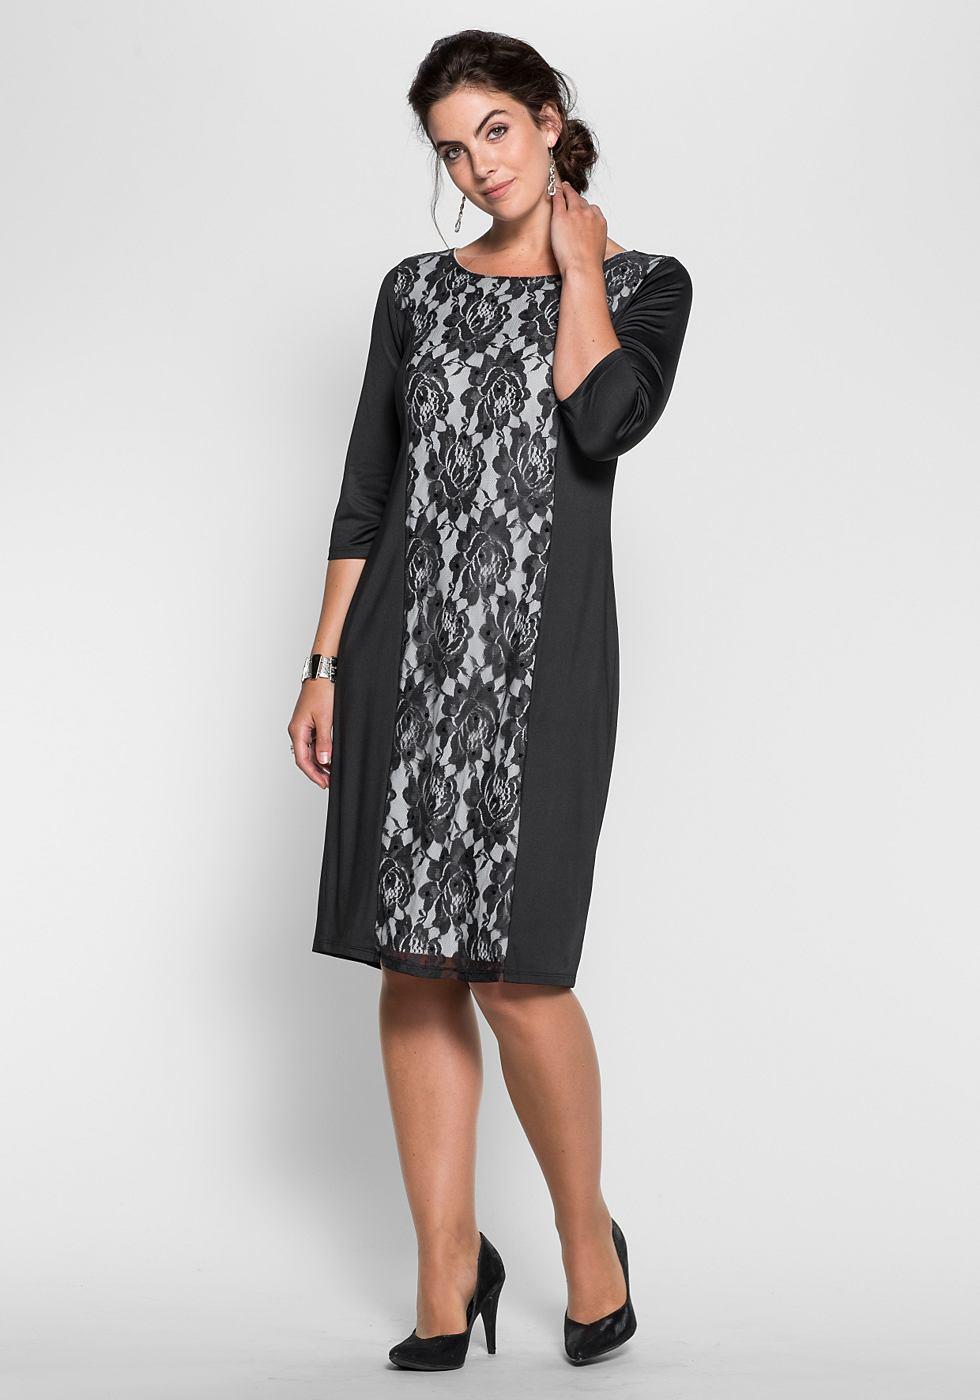 Sheego Style jerseyjurk met kanten inzet zwart